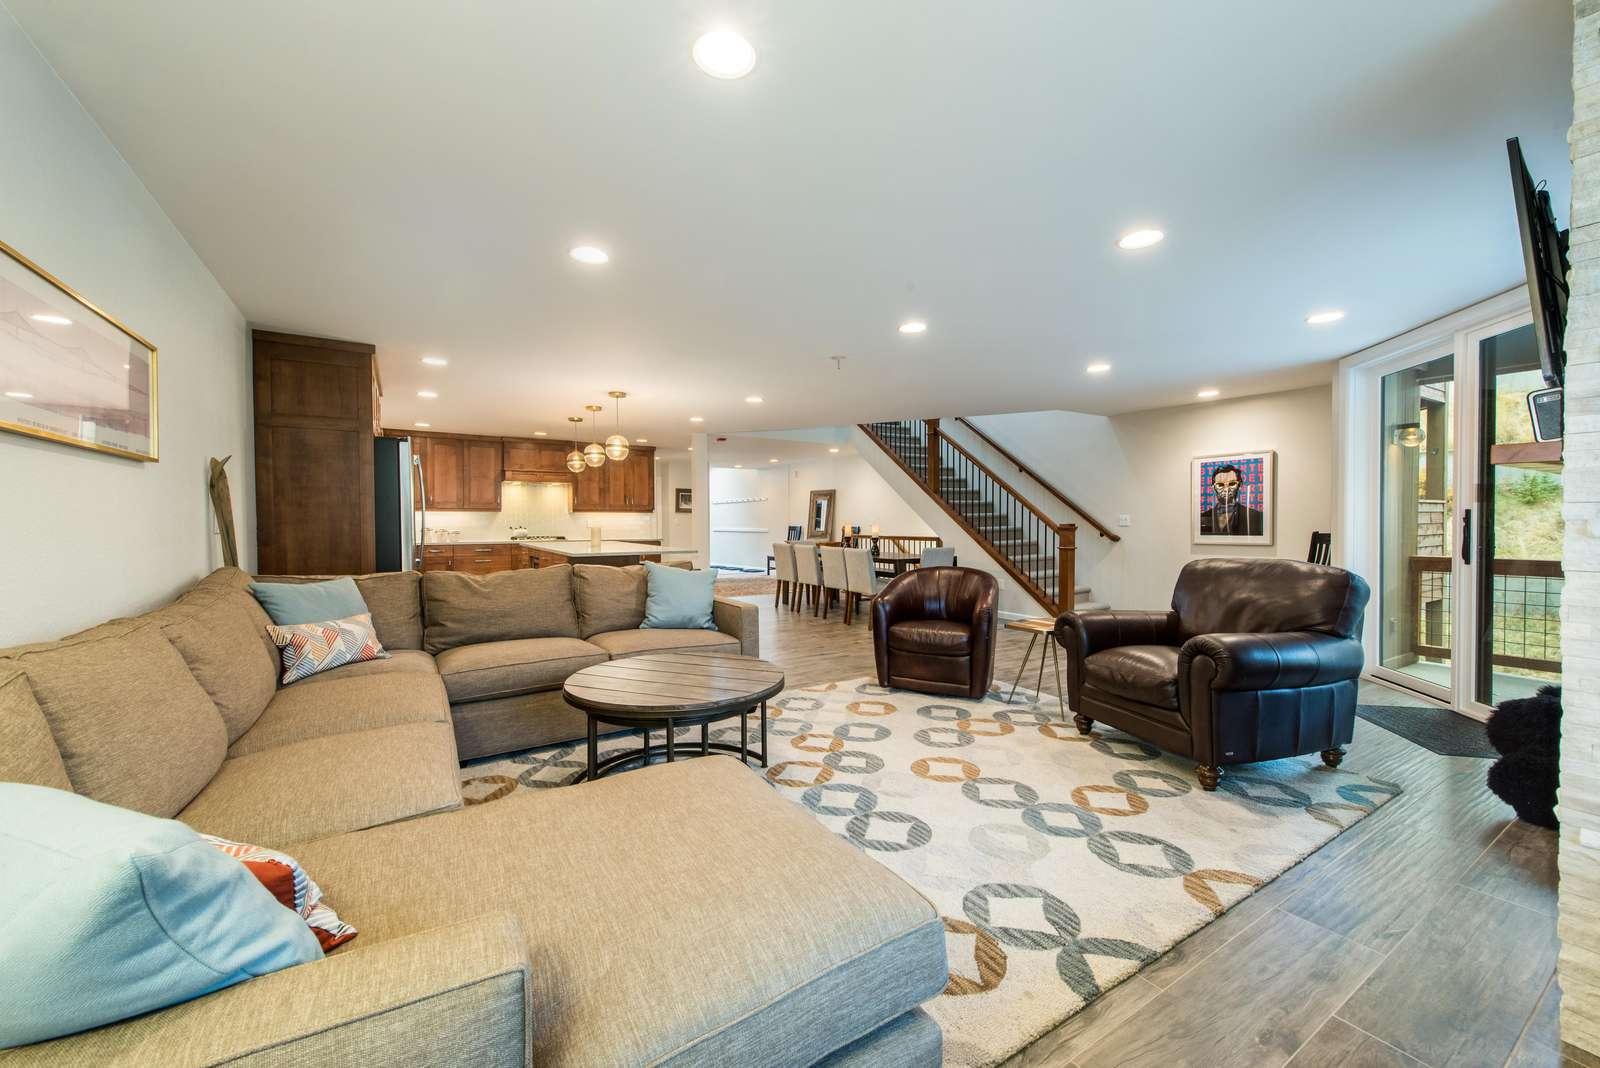 Comfortable furnishings for everyone